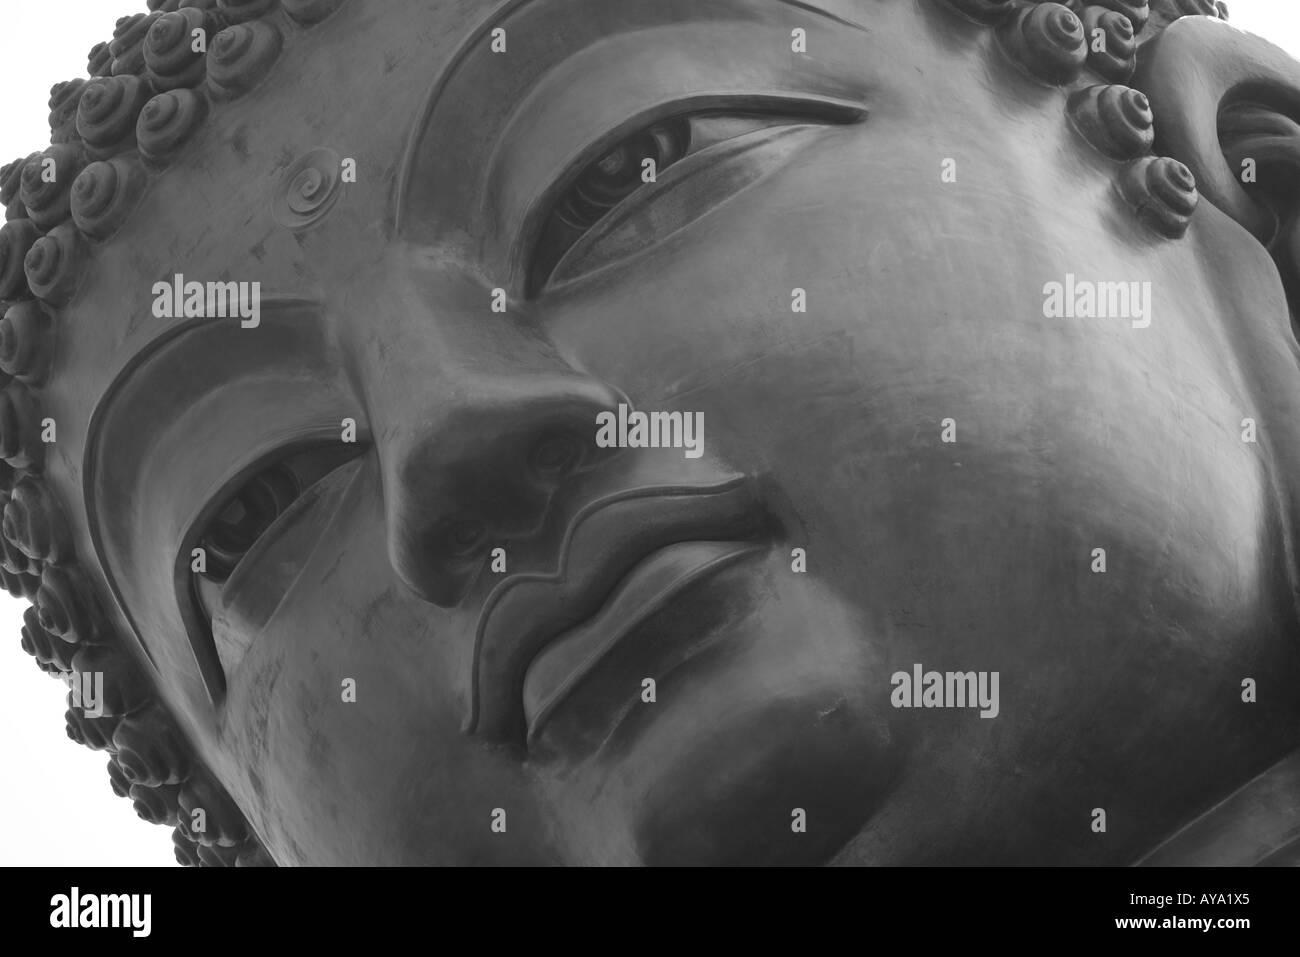 Asia Peoples Republic of China Hong Kong Tian Tan Buddha Statue at Po Lin Monastery on Lantau Island - Stock Image